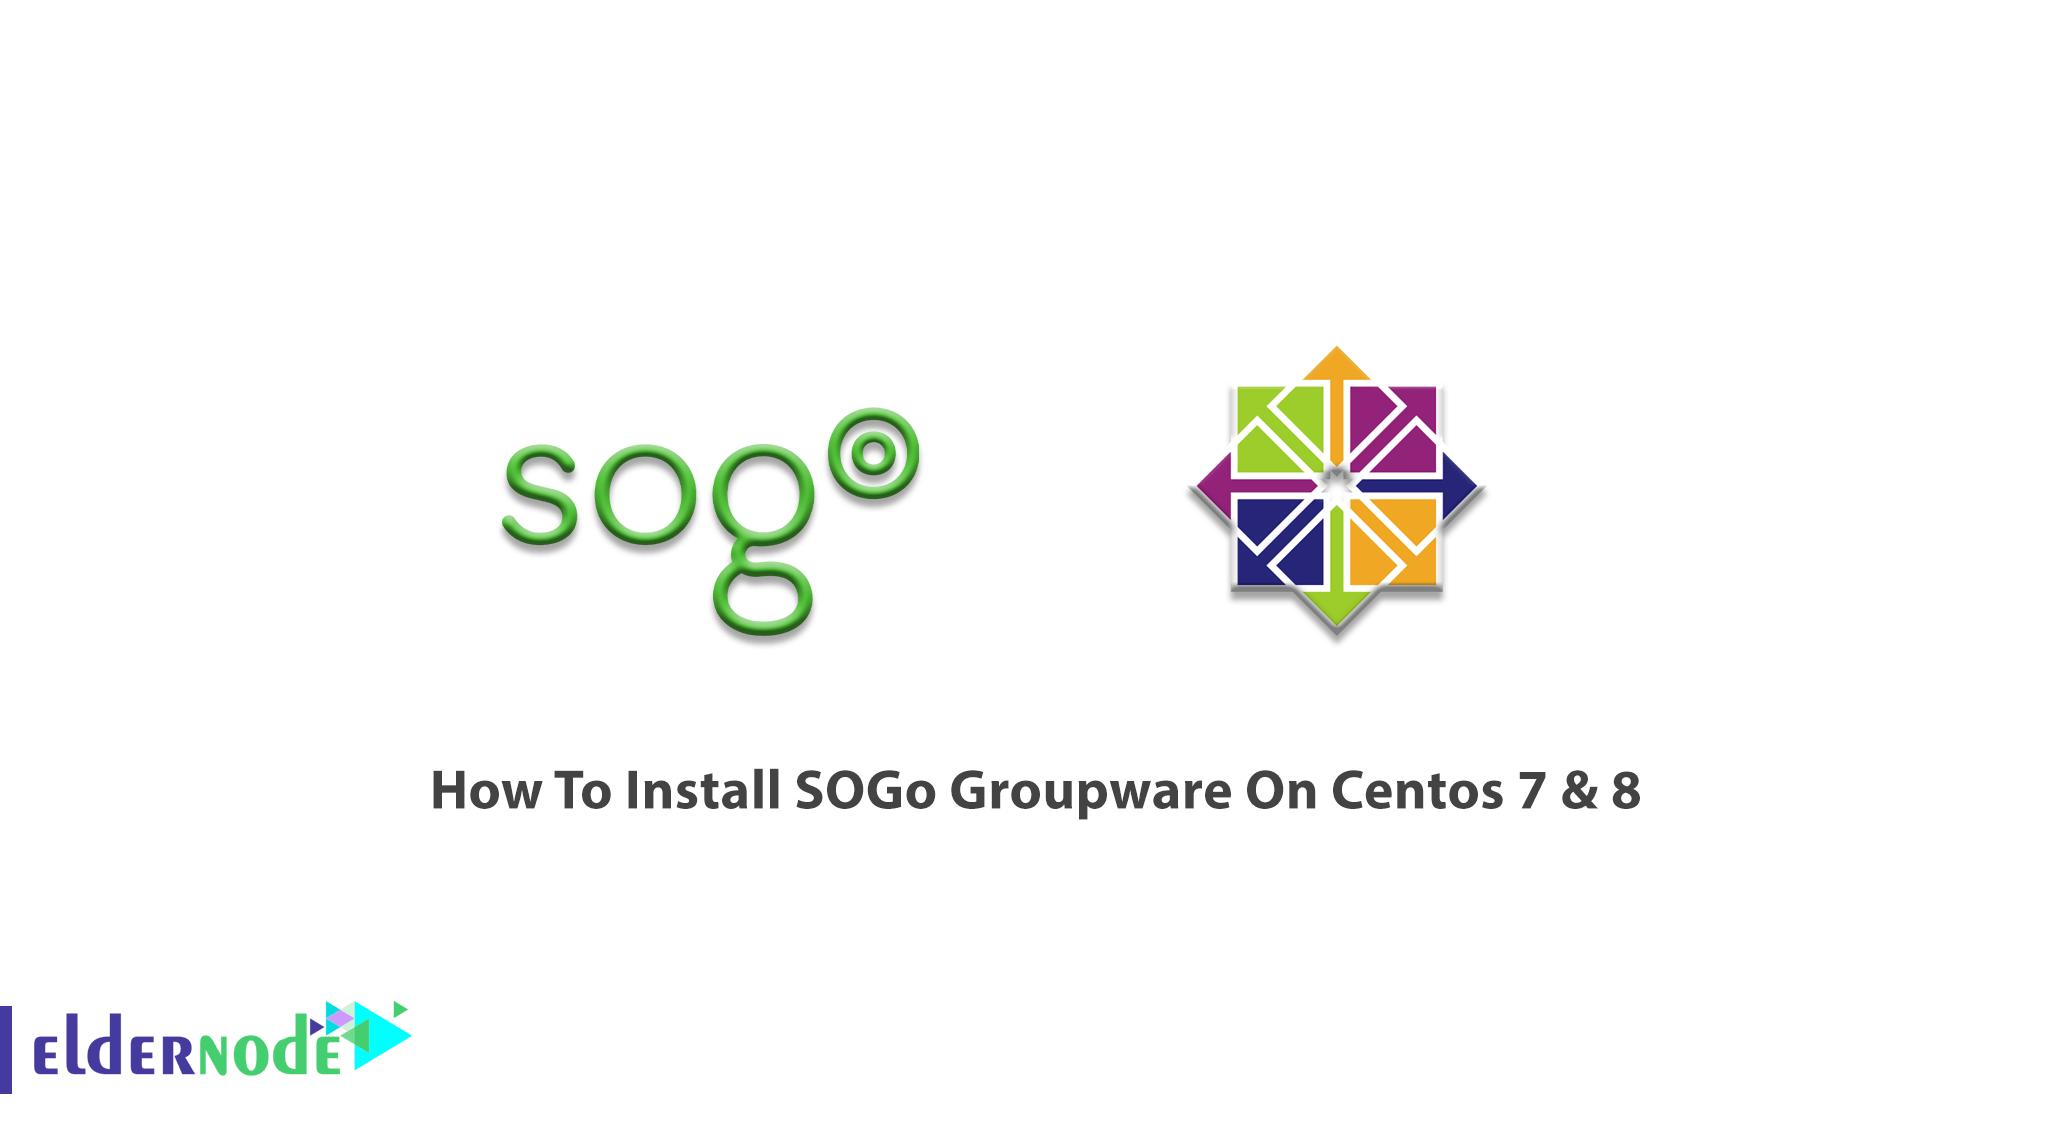 How To Install SOGo Groupware On Centos 7 & 8